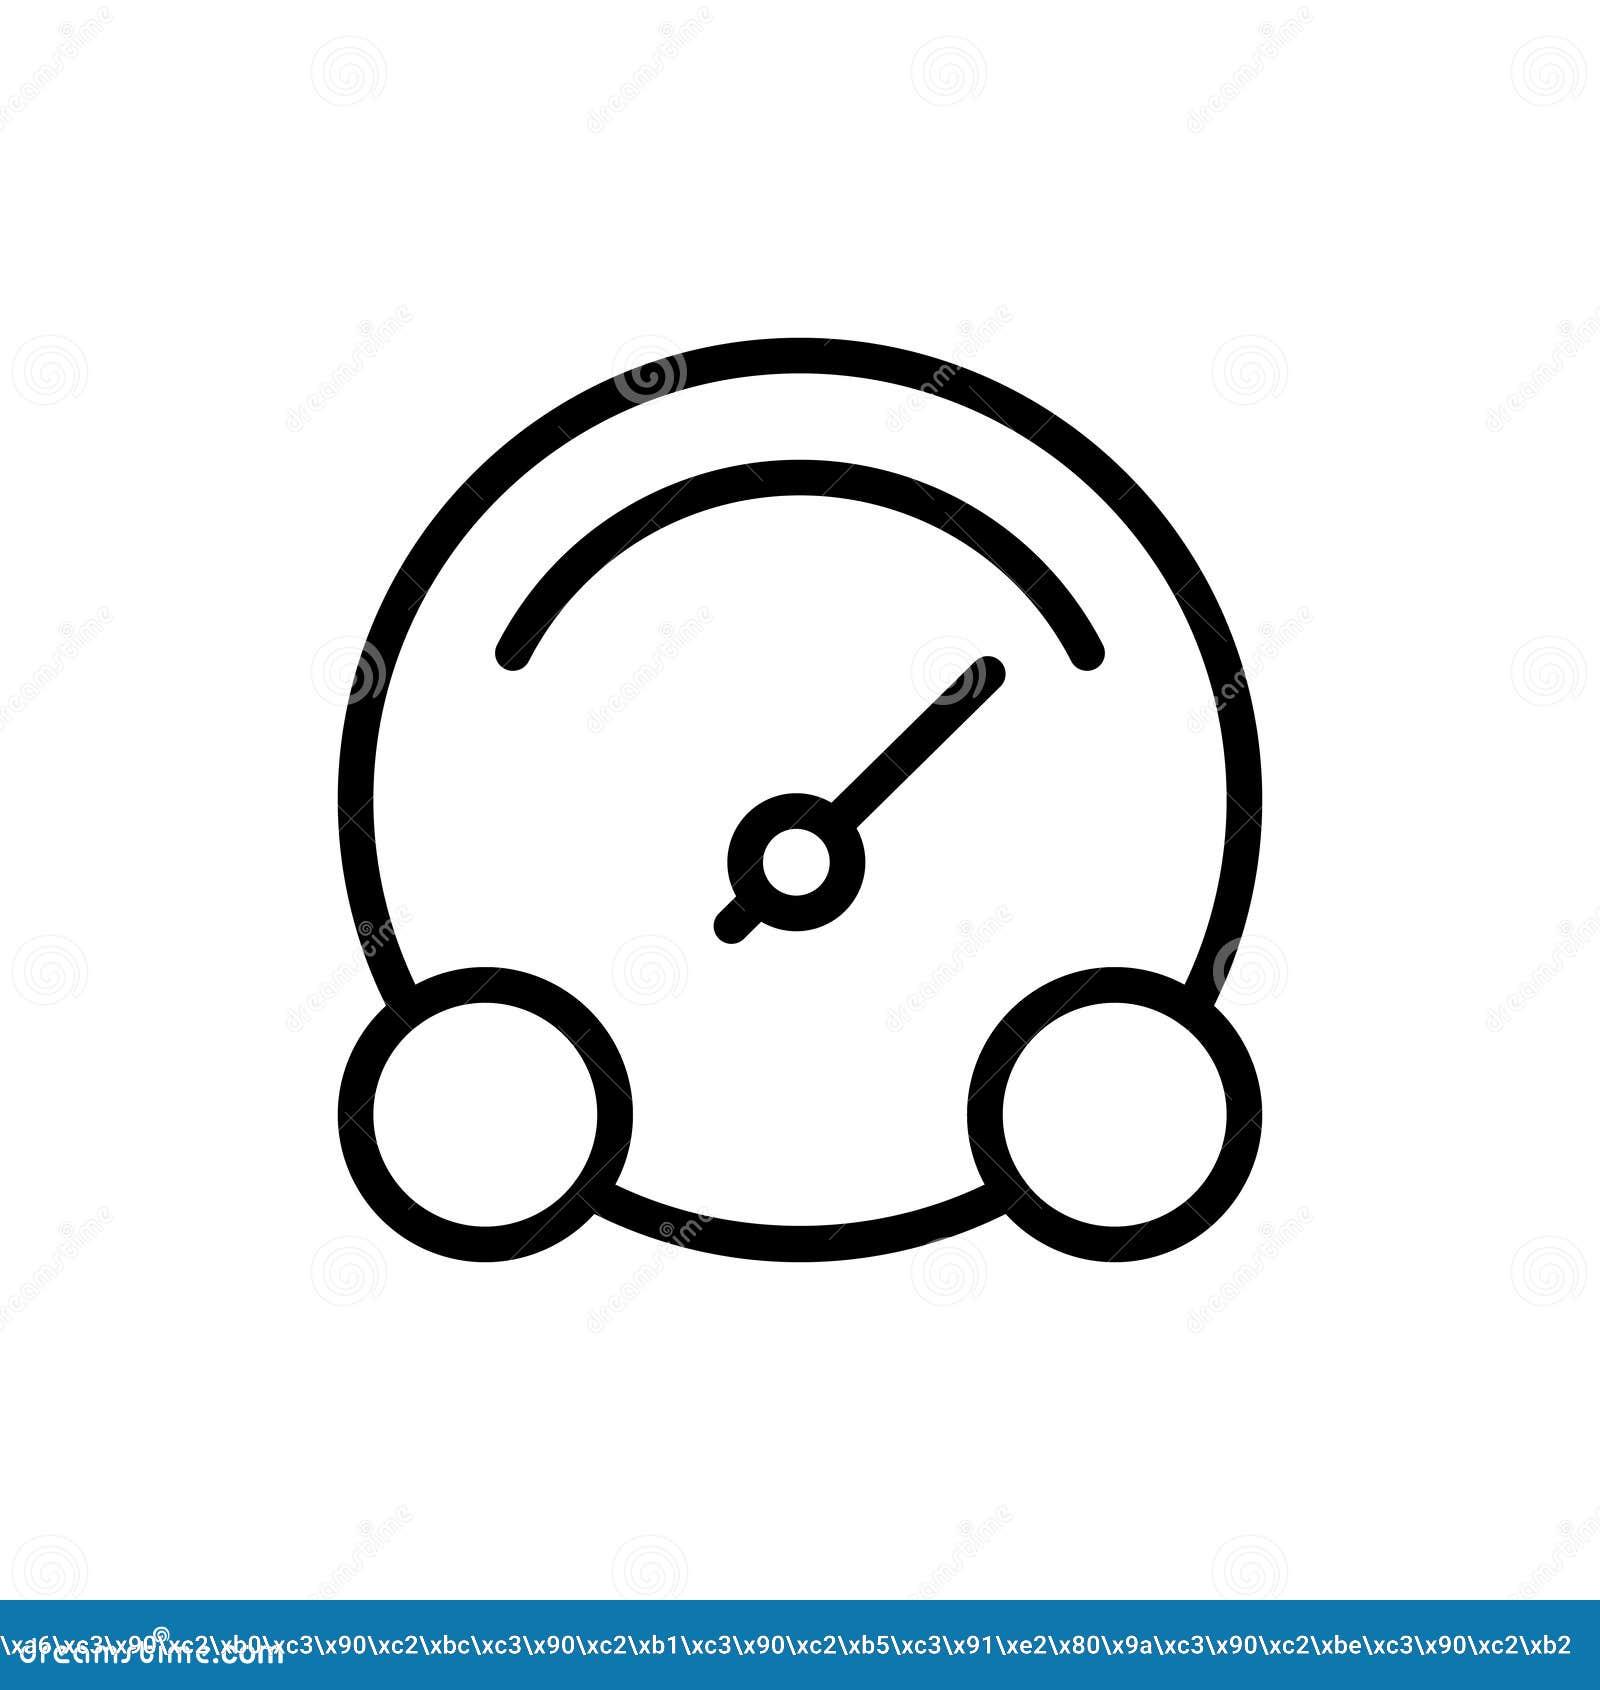 Speedometer Line Icon Stock Vector Illustration Of Control 102672857